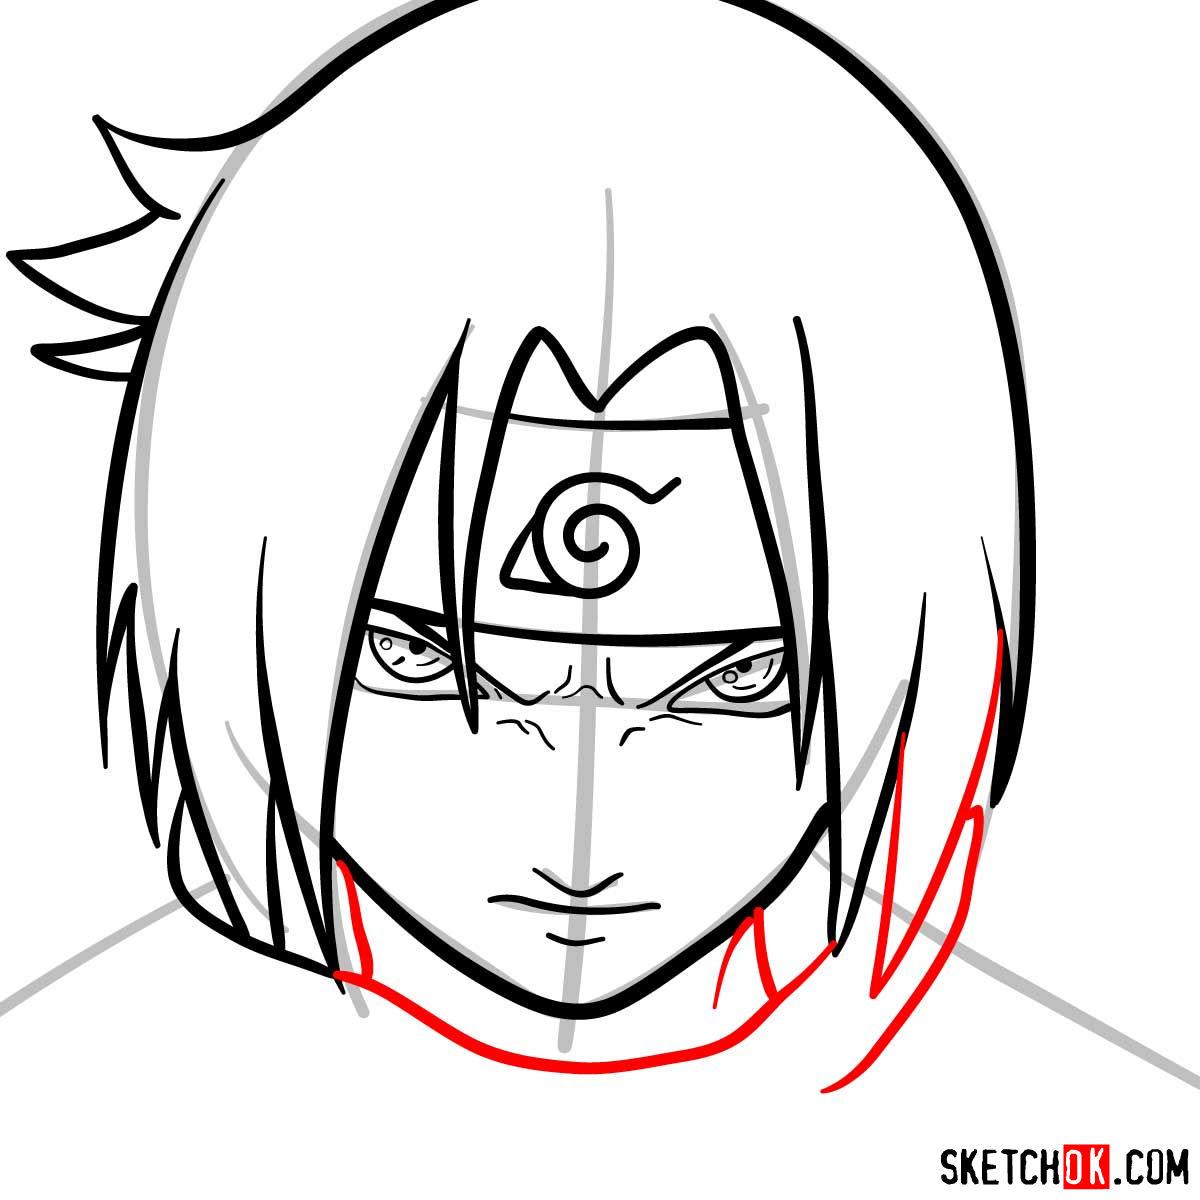 How to draw Sasuke's face (Naruto anime) - step 08